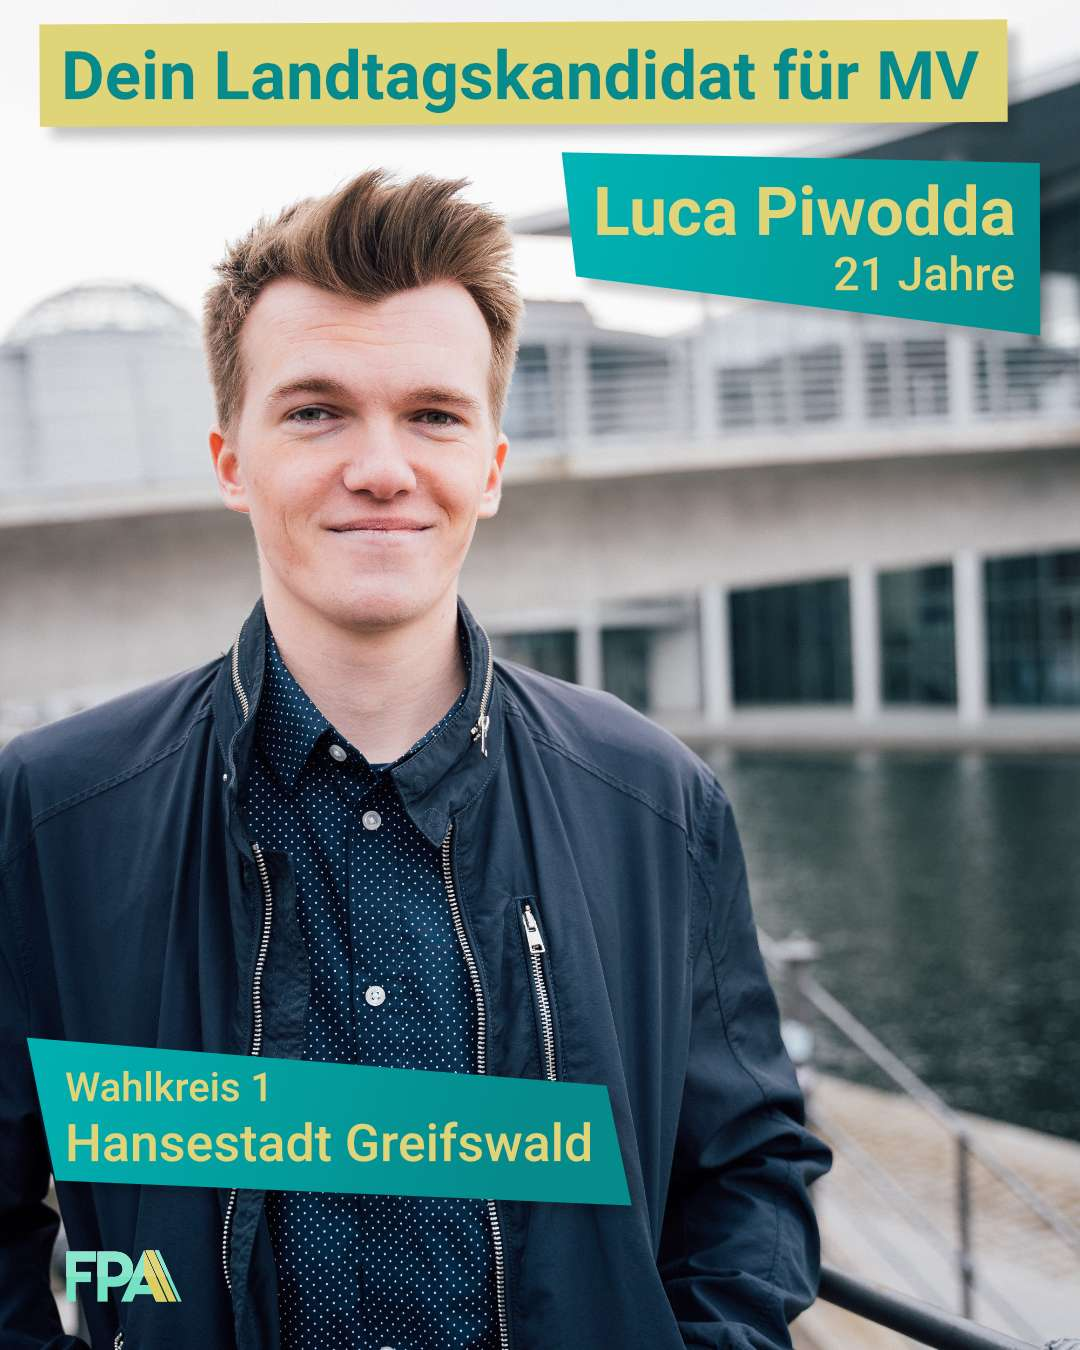 Luca Piwodda